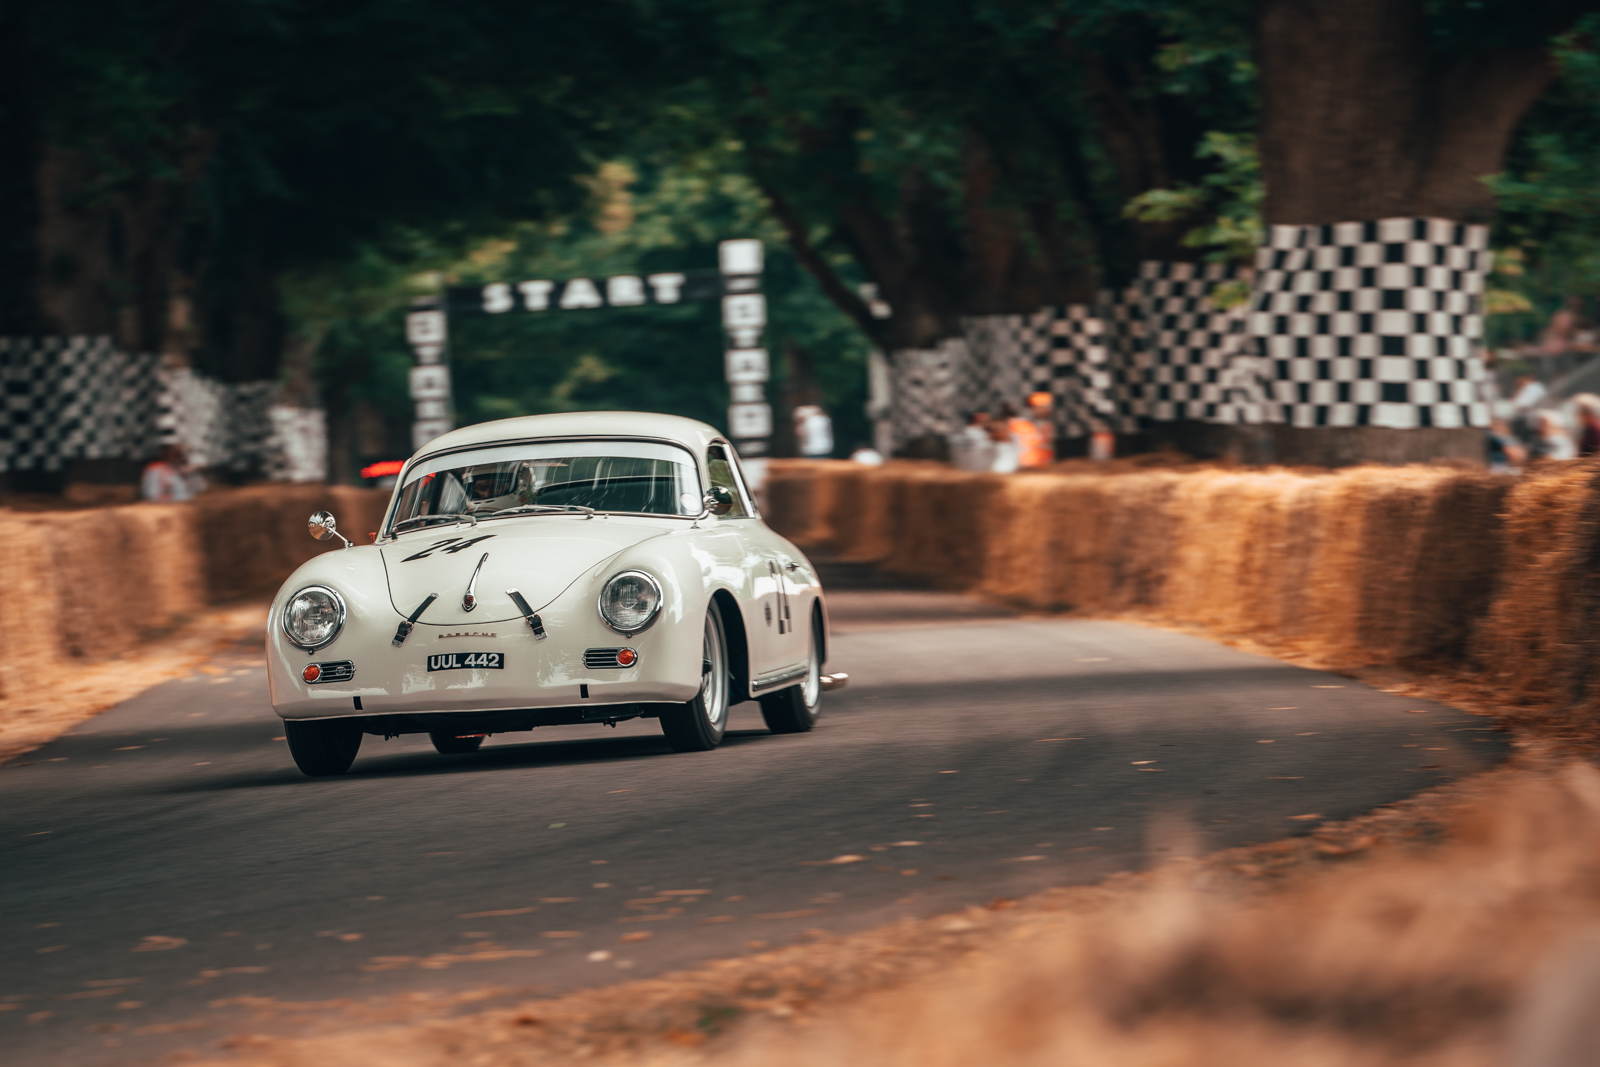 RP - Porsche Goodwood Fesitval of Speed 70 Years 2018-32.jpg